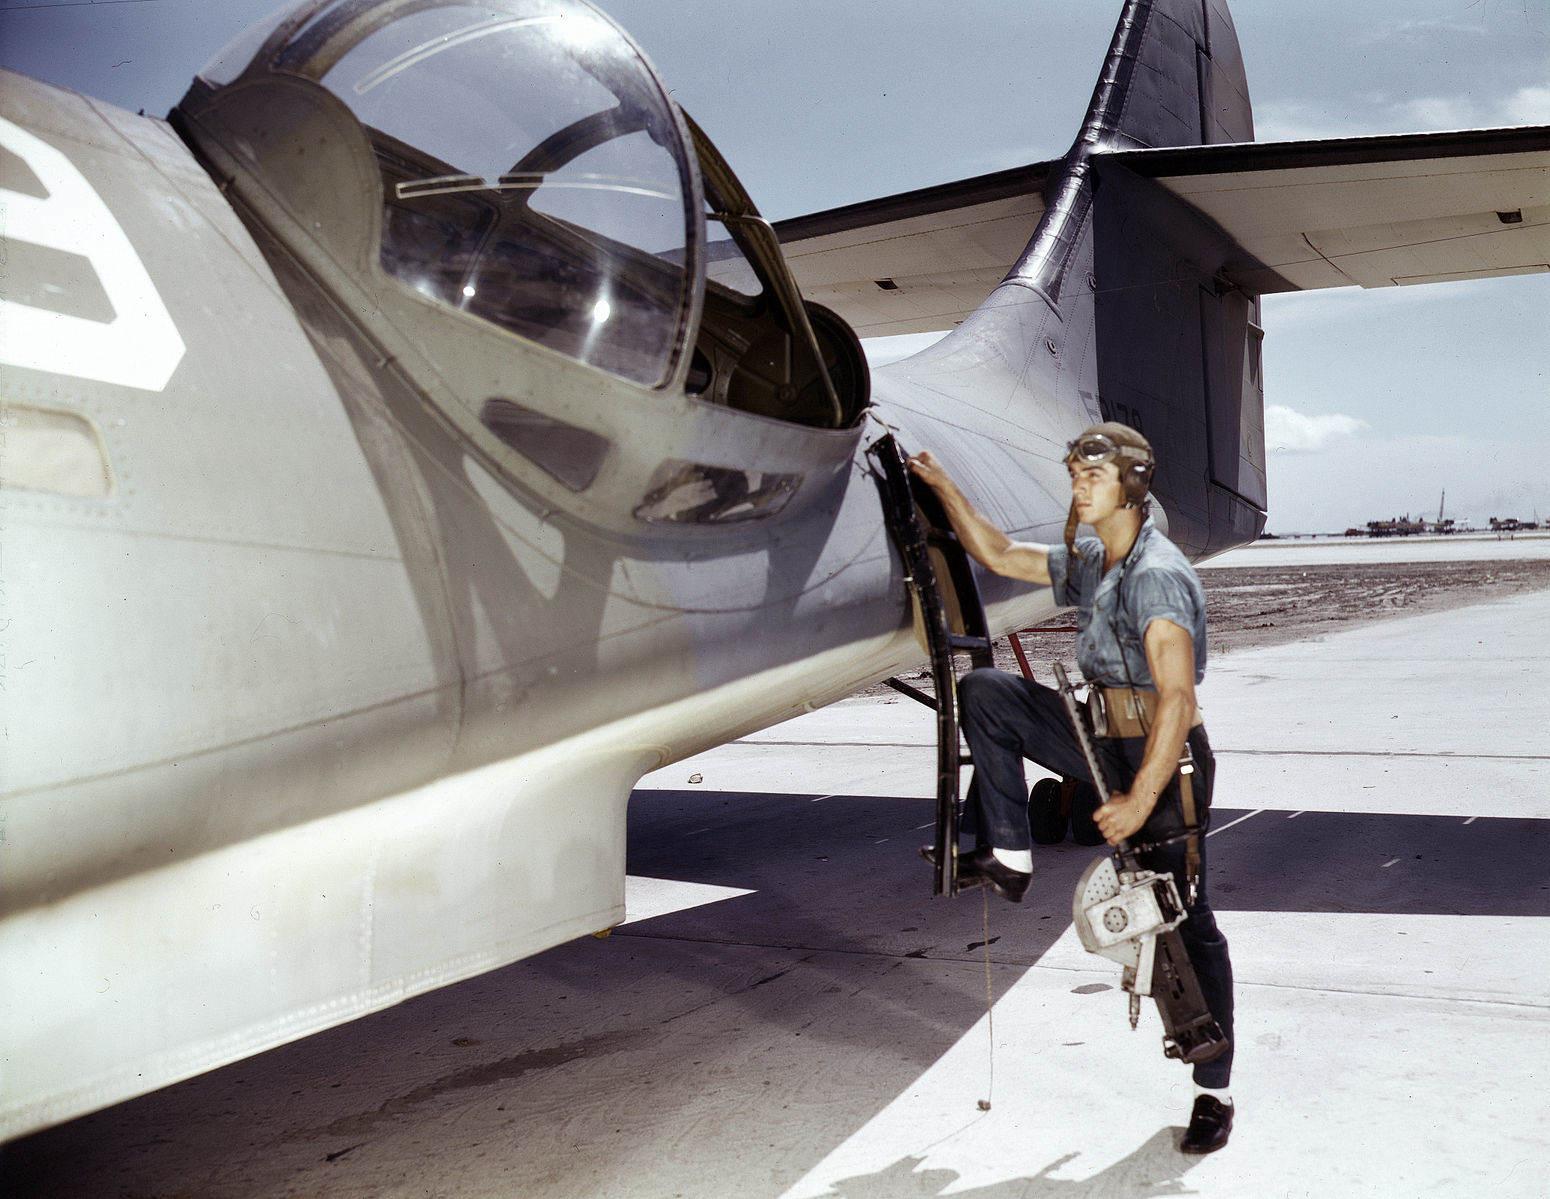 PBY Gun Blister - Installation d'une M1919A5 dans un avion PBY par Jesse Rhodes Waller, en 1942